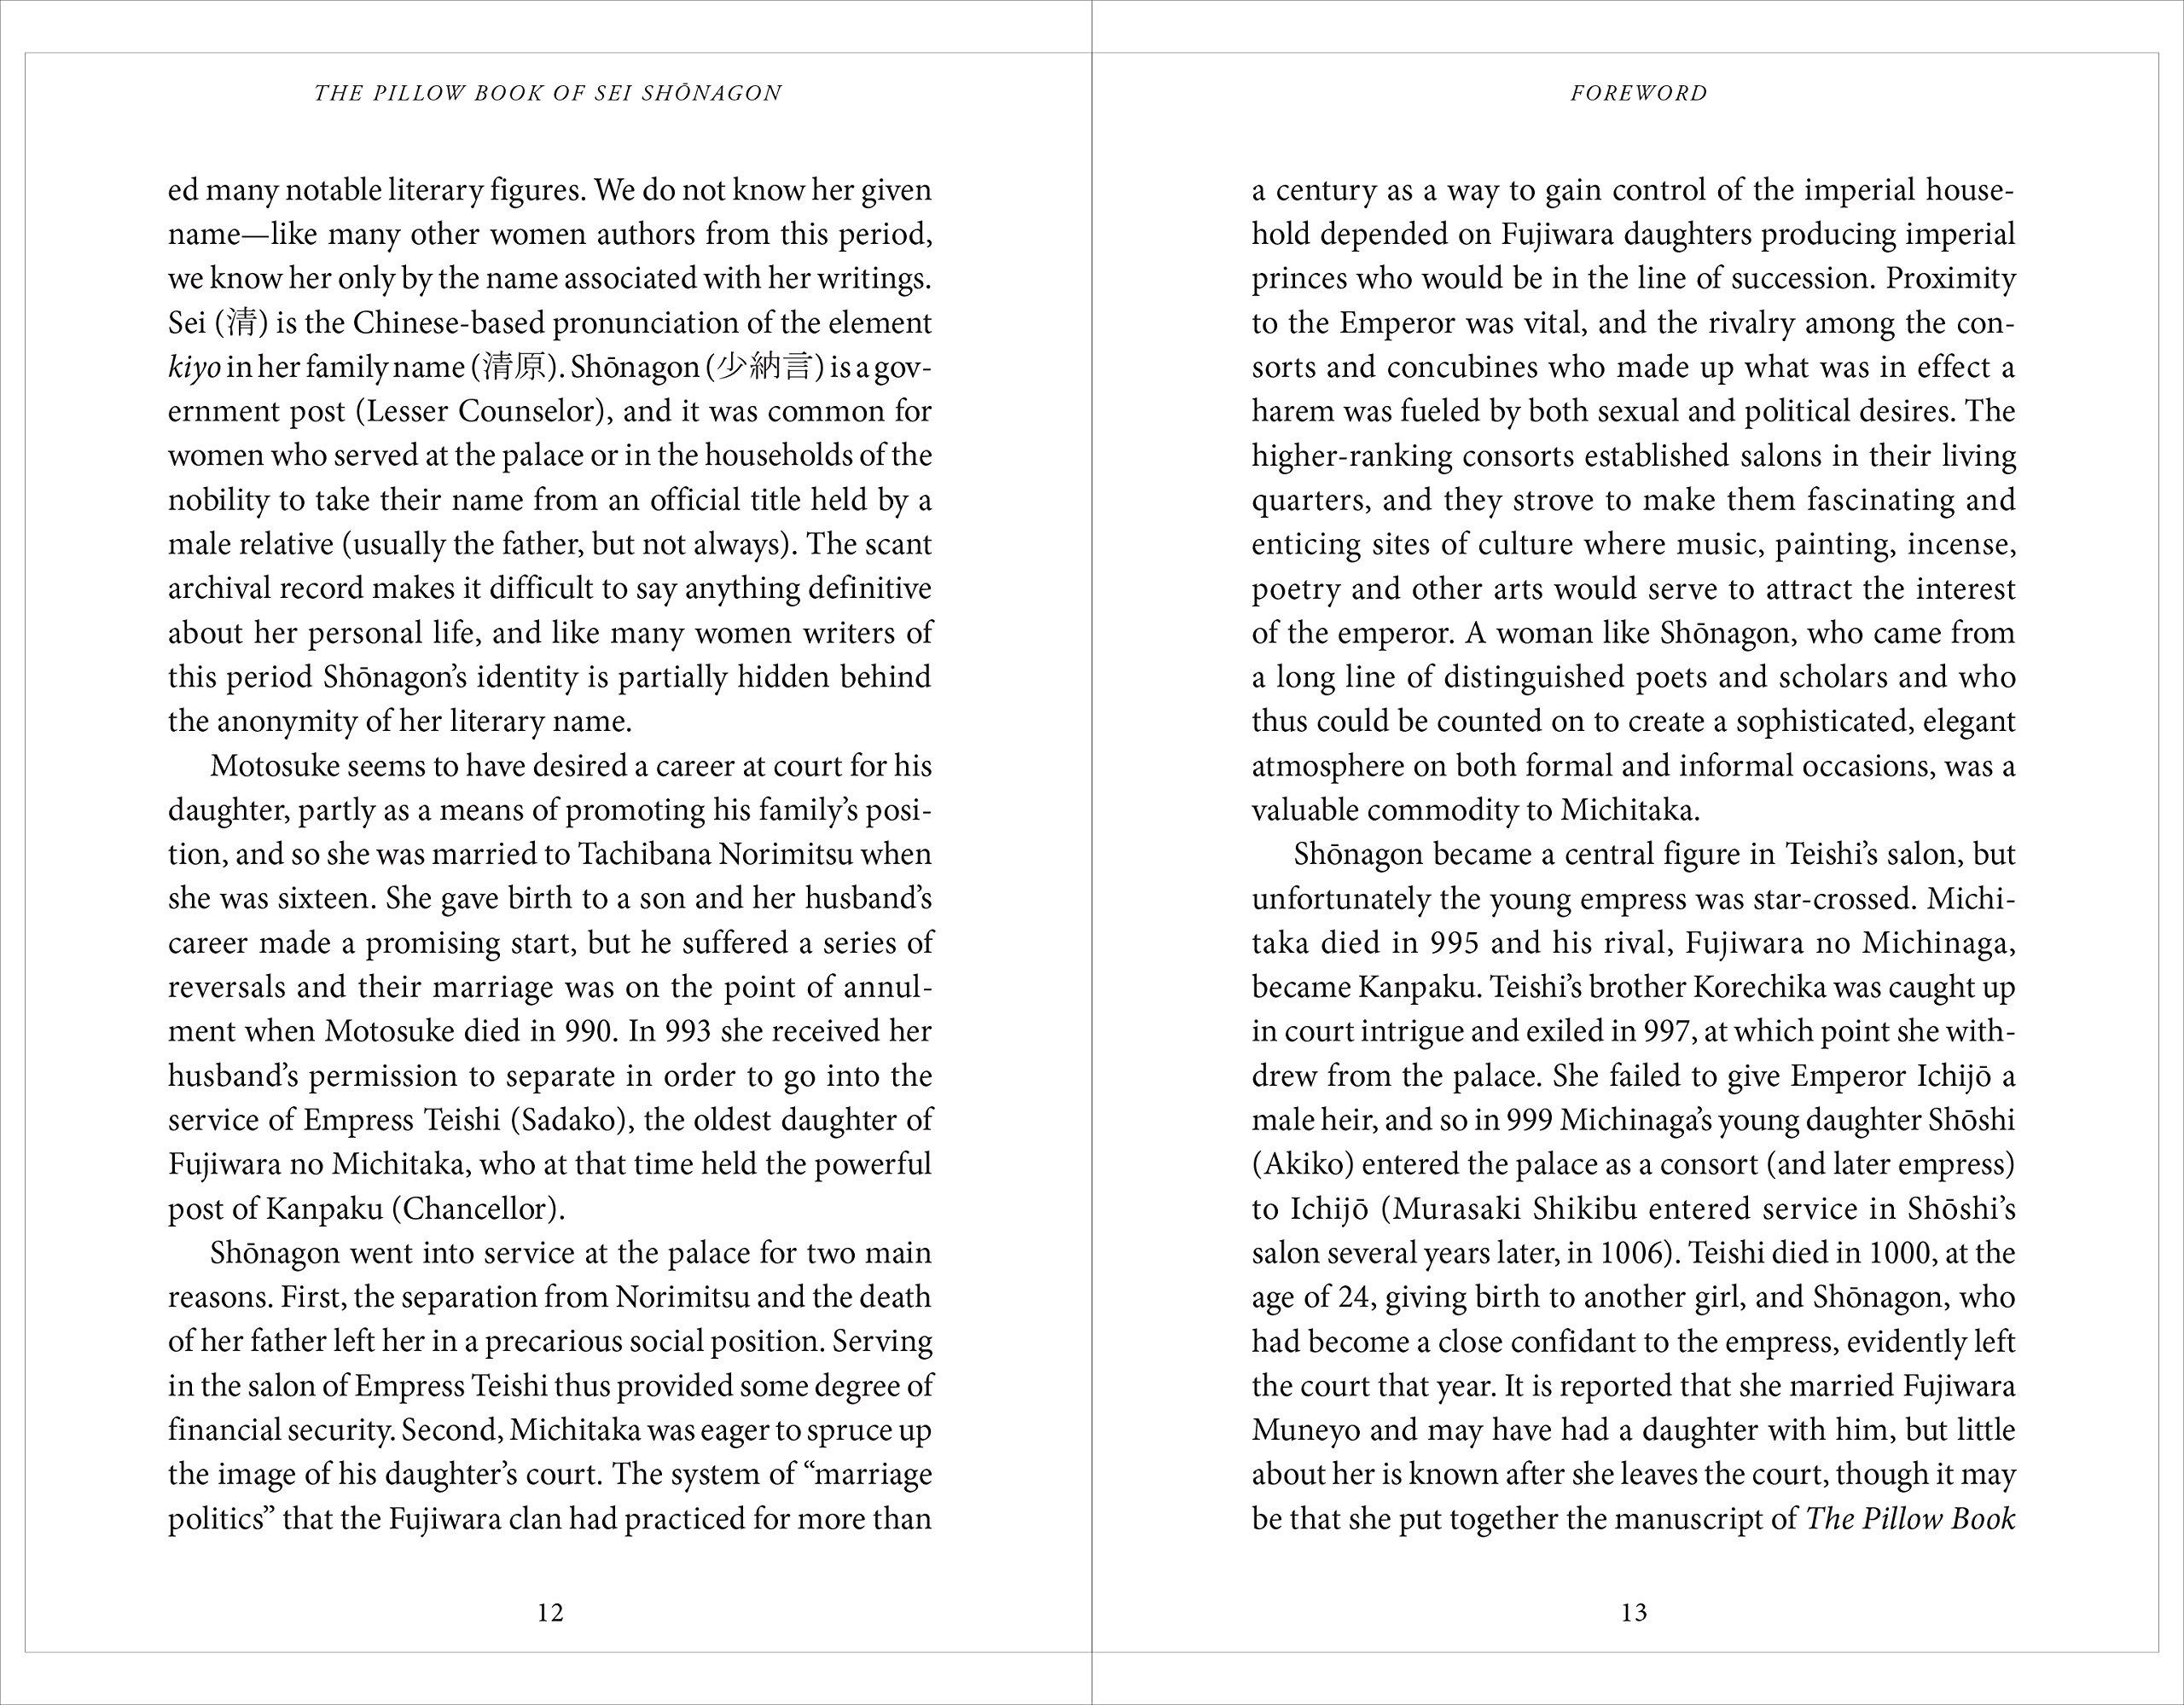 Amazon.com: The Pillow Book of Sei Shonagon: The Diary of a Courtesan in  Tenth Century Japan (9784805314623): Arthur Waley, Dennis Washburn: Books